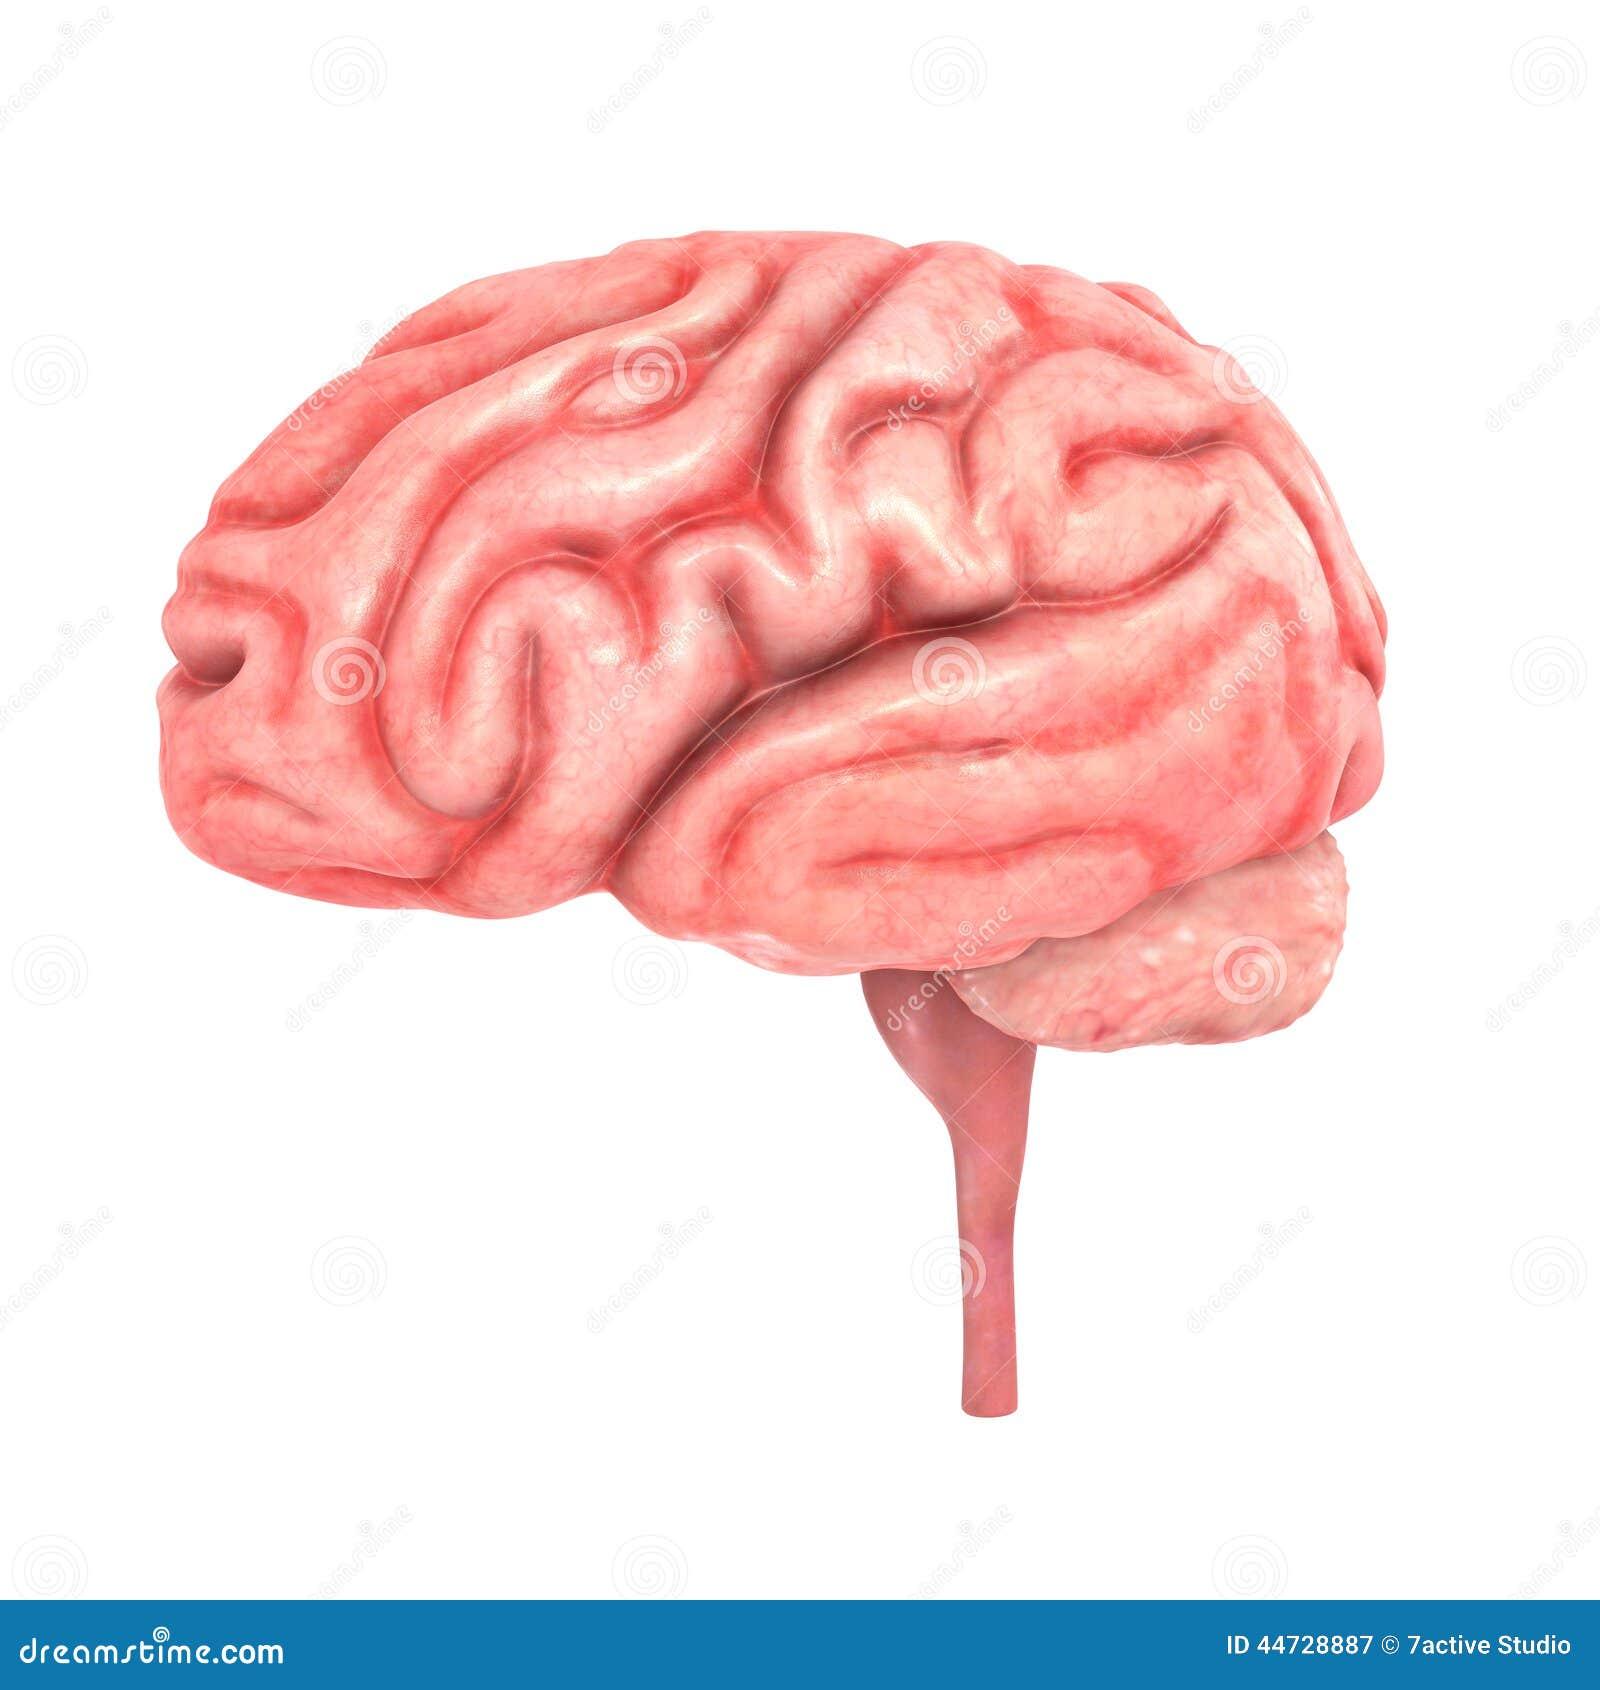 Human brain stock illustration illustration of mind 44728887 download human brain stock illustration illustration of mind 44728887 ccuart Images